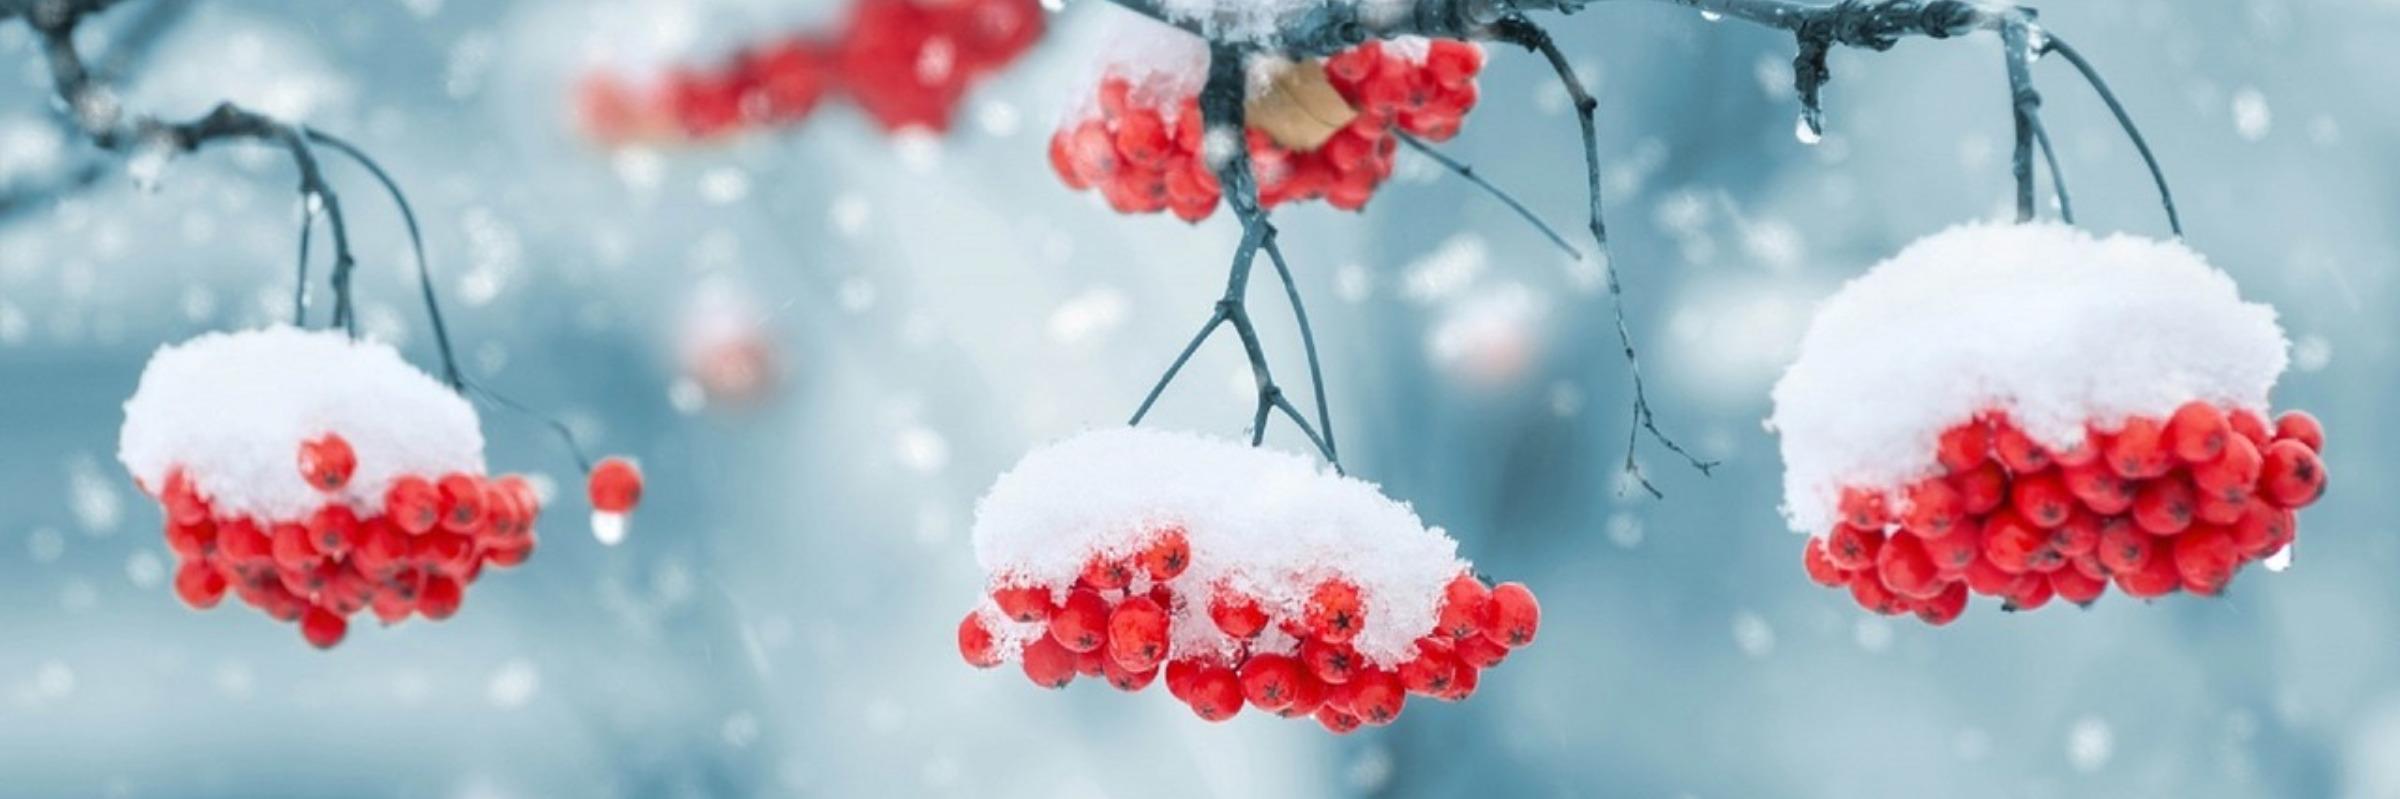 Winter (iarna)  Snow-on-berries-1379880_1280-10635-1